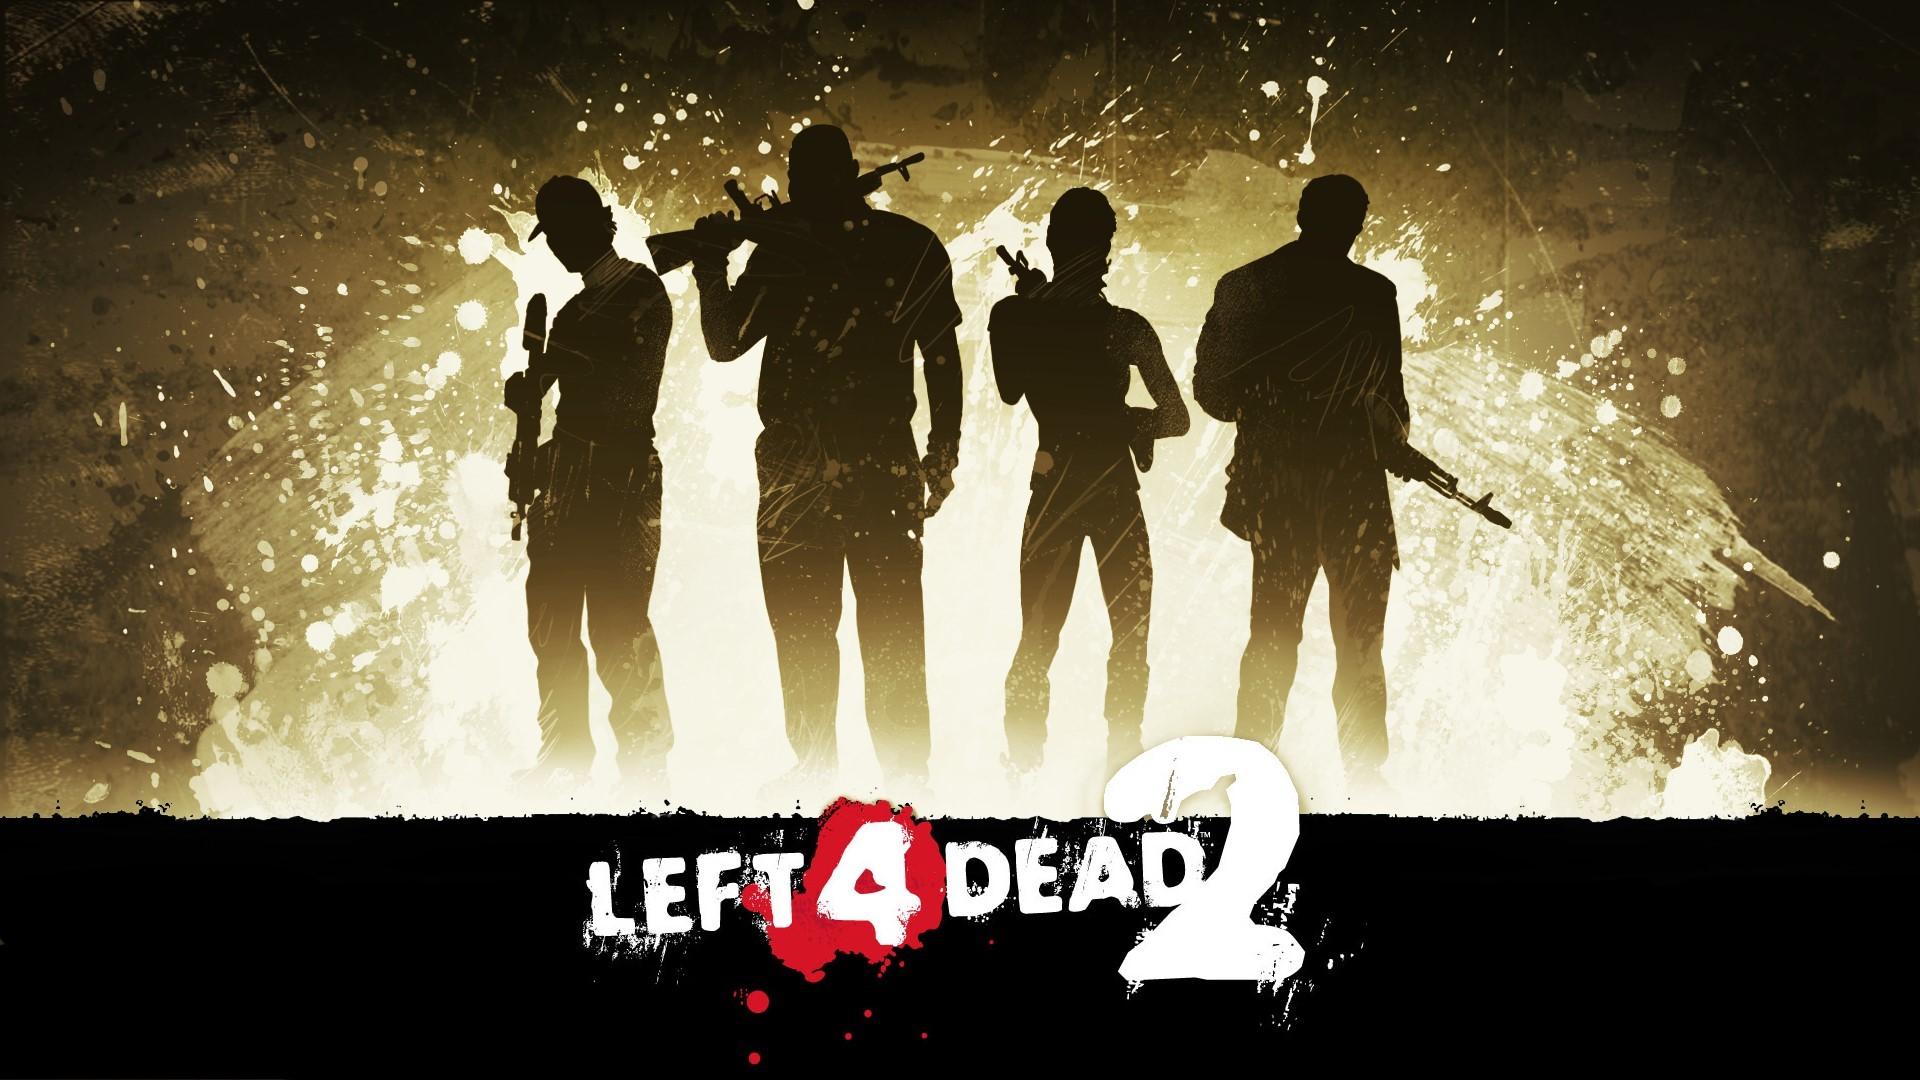 Left 4 Dead 2 [Steam аккаунт] 100% Гарантия